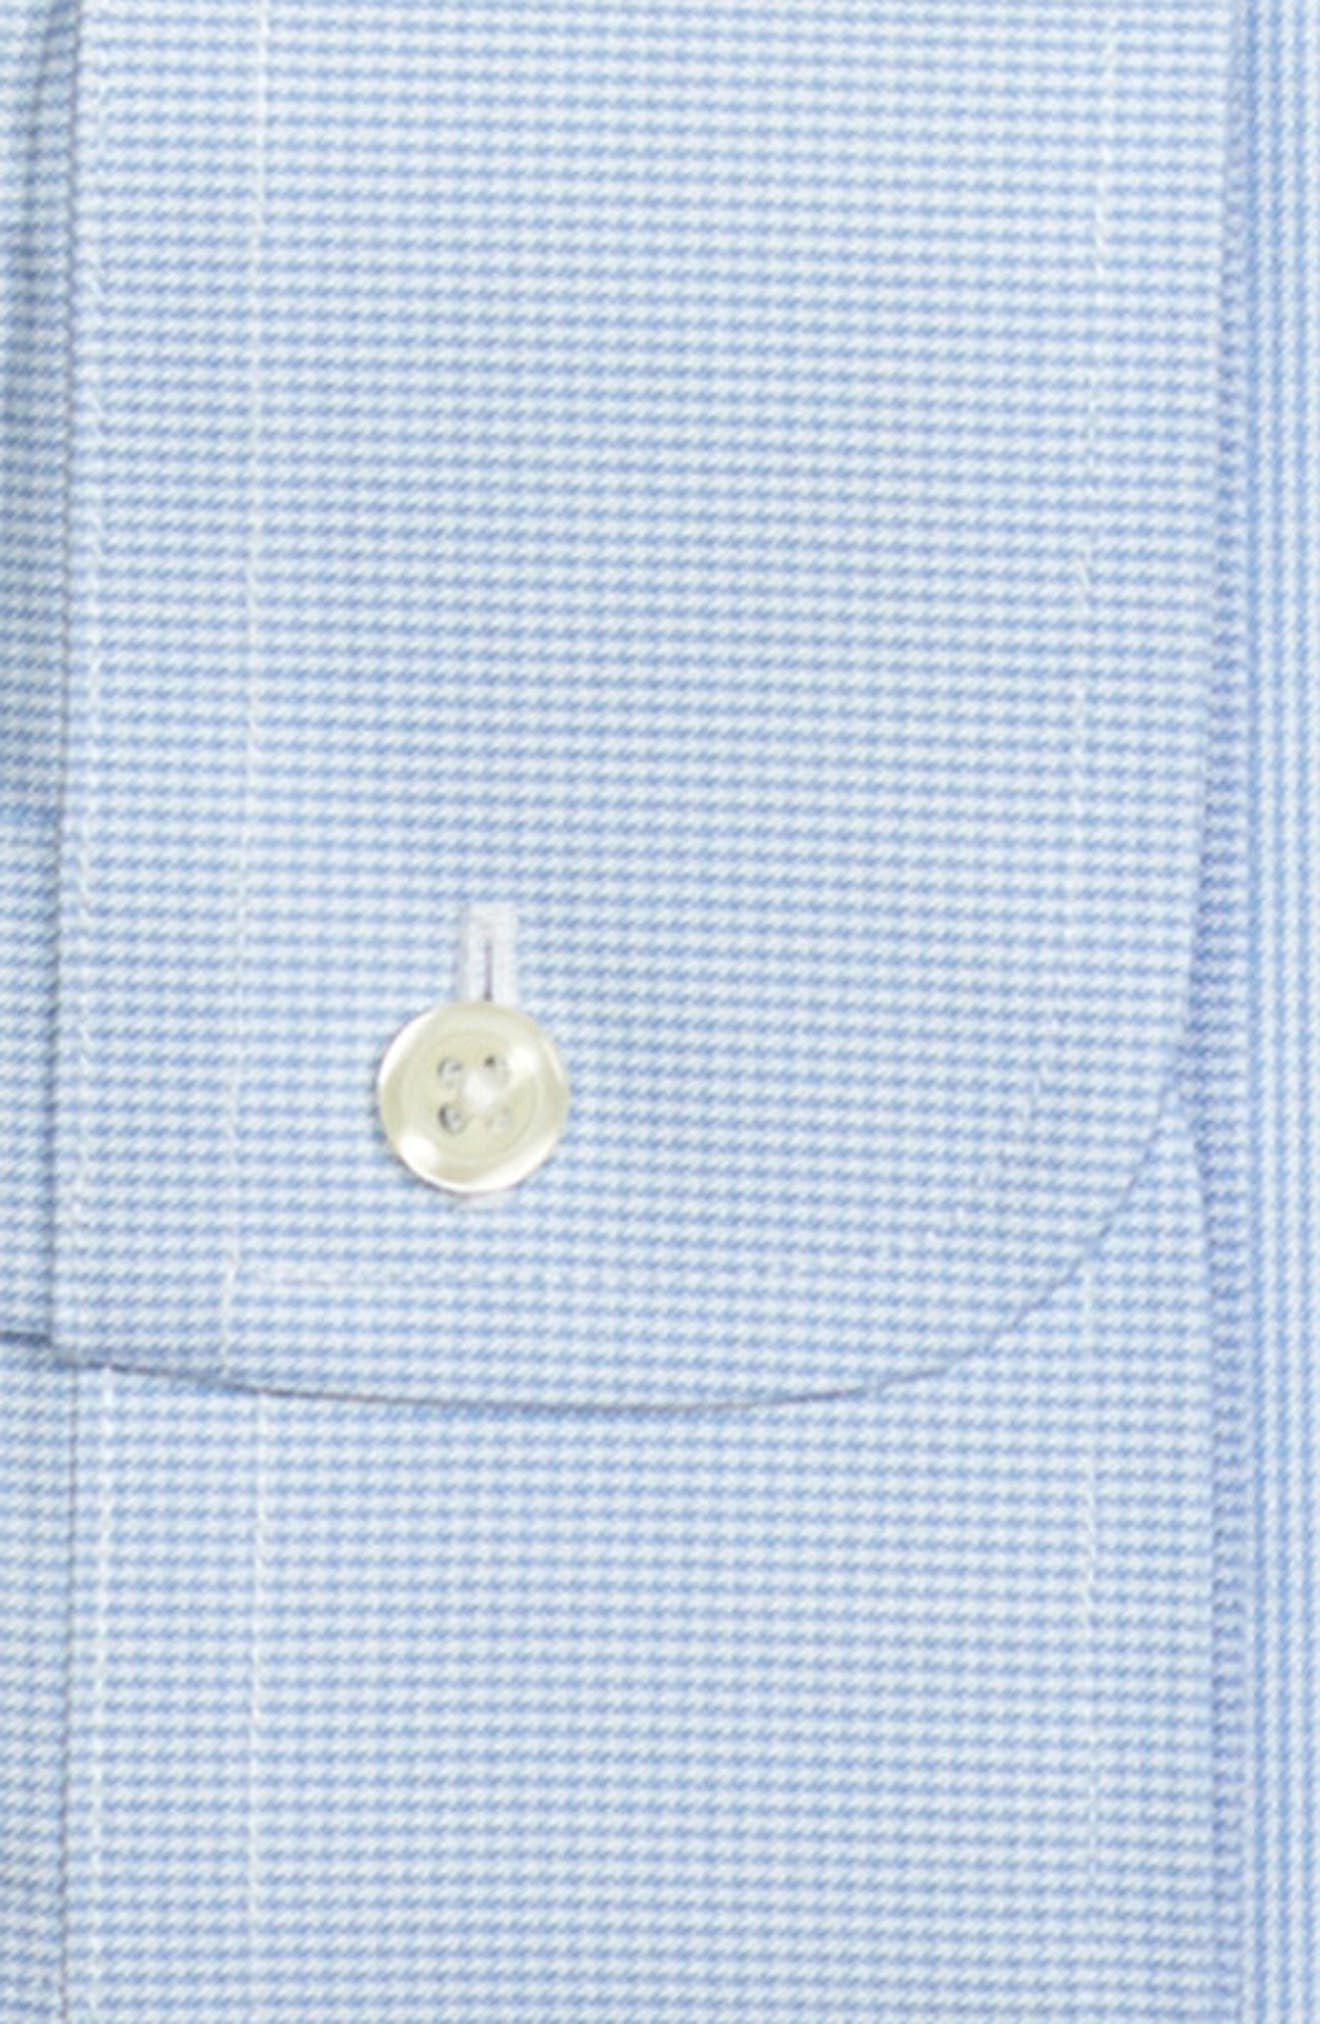 Regular Fit Houndstooth Dress Shirt,                             Alternate thumbnail 2, color,                             LIGHT/ PASTEL BLUE